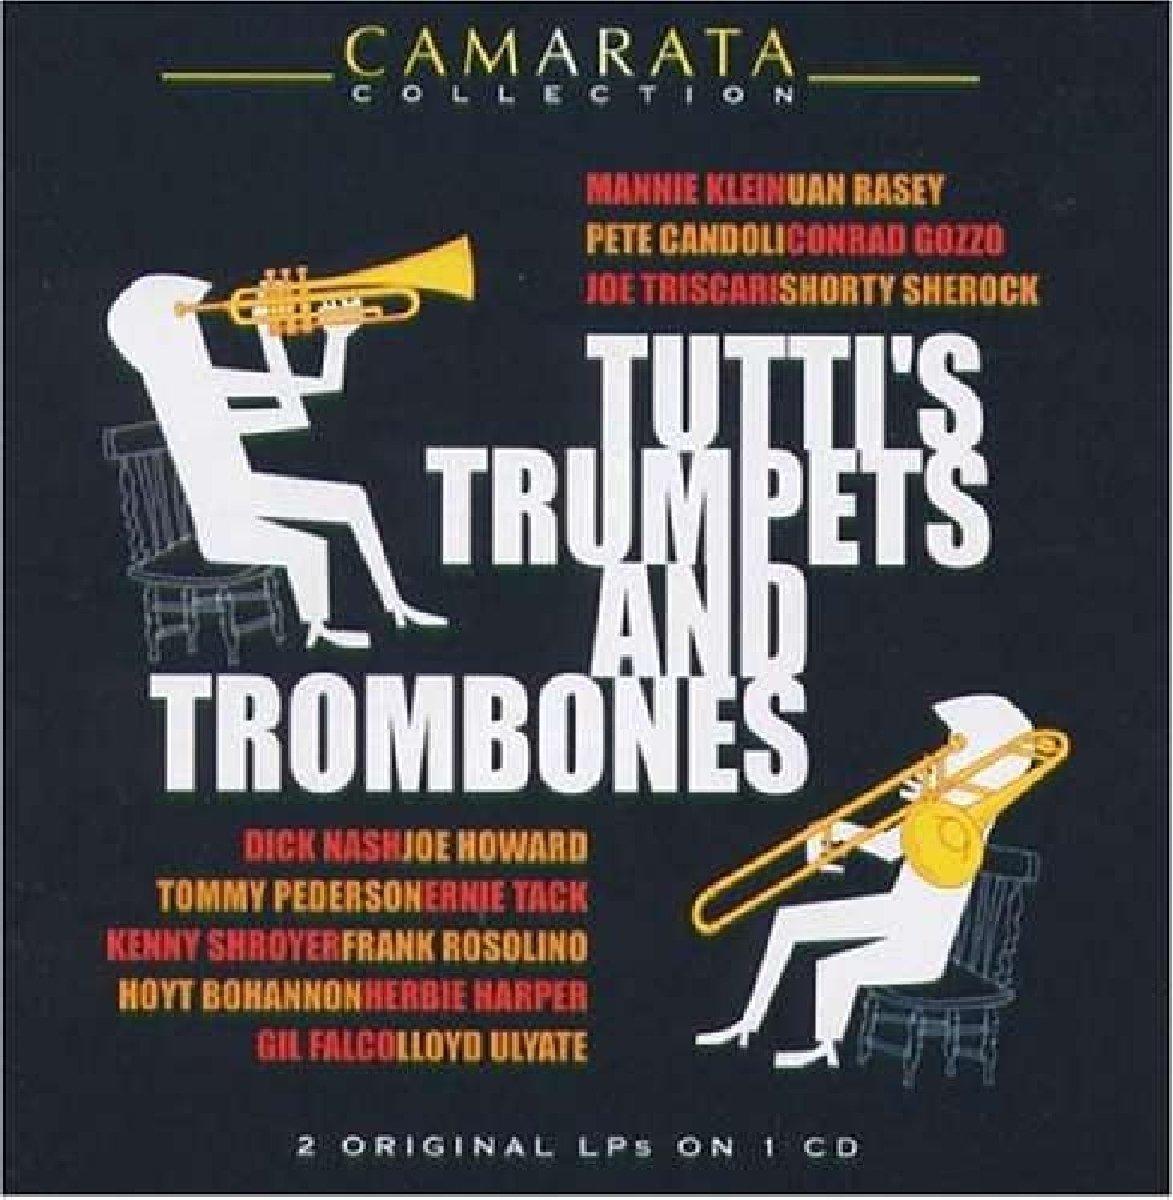 Art for Lassus Trombone by Tutti Camarata